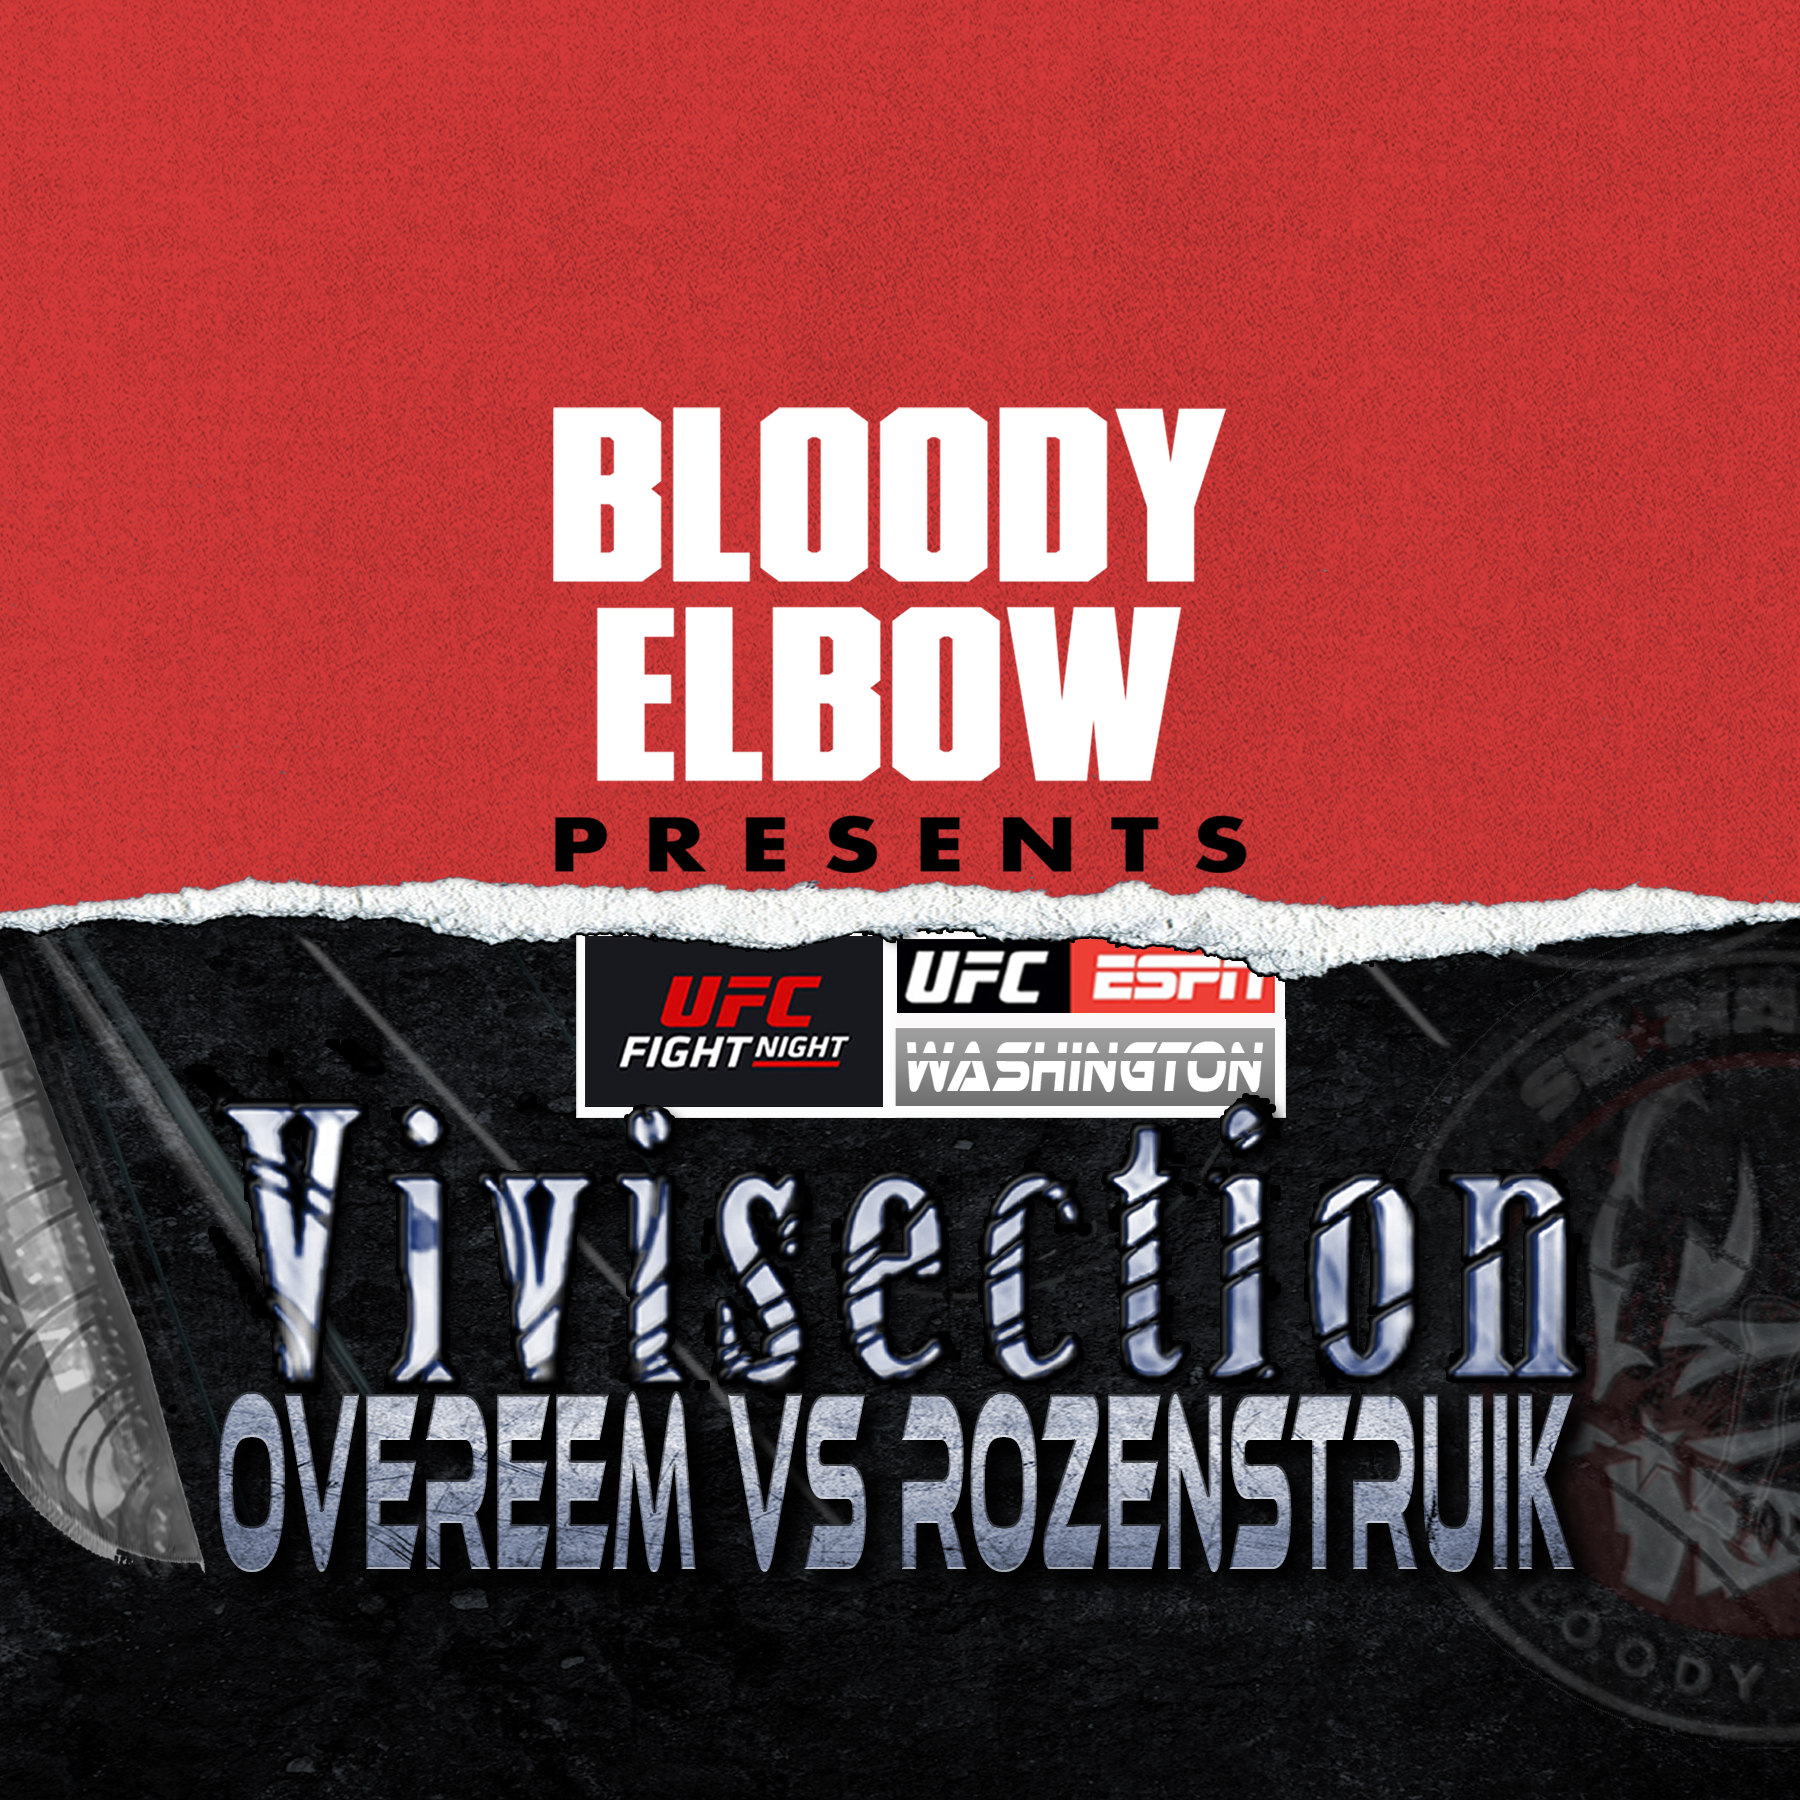 MMA Vivi, The MMA Vivisection, Prelims Show, Main Card, UFC on ESPN 7, UFC Fight Night Washington DC, Overeem vs Rozenstruik, UFC Preview, UFC Picks, UFC Odds